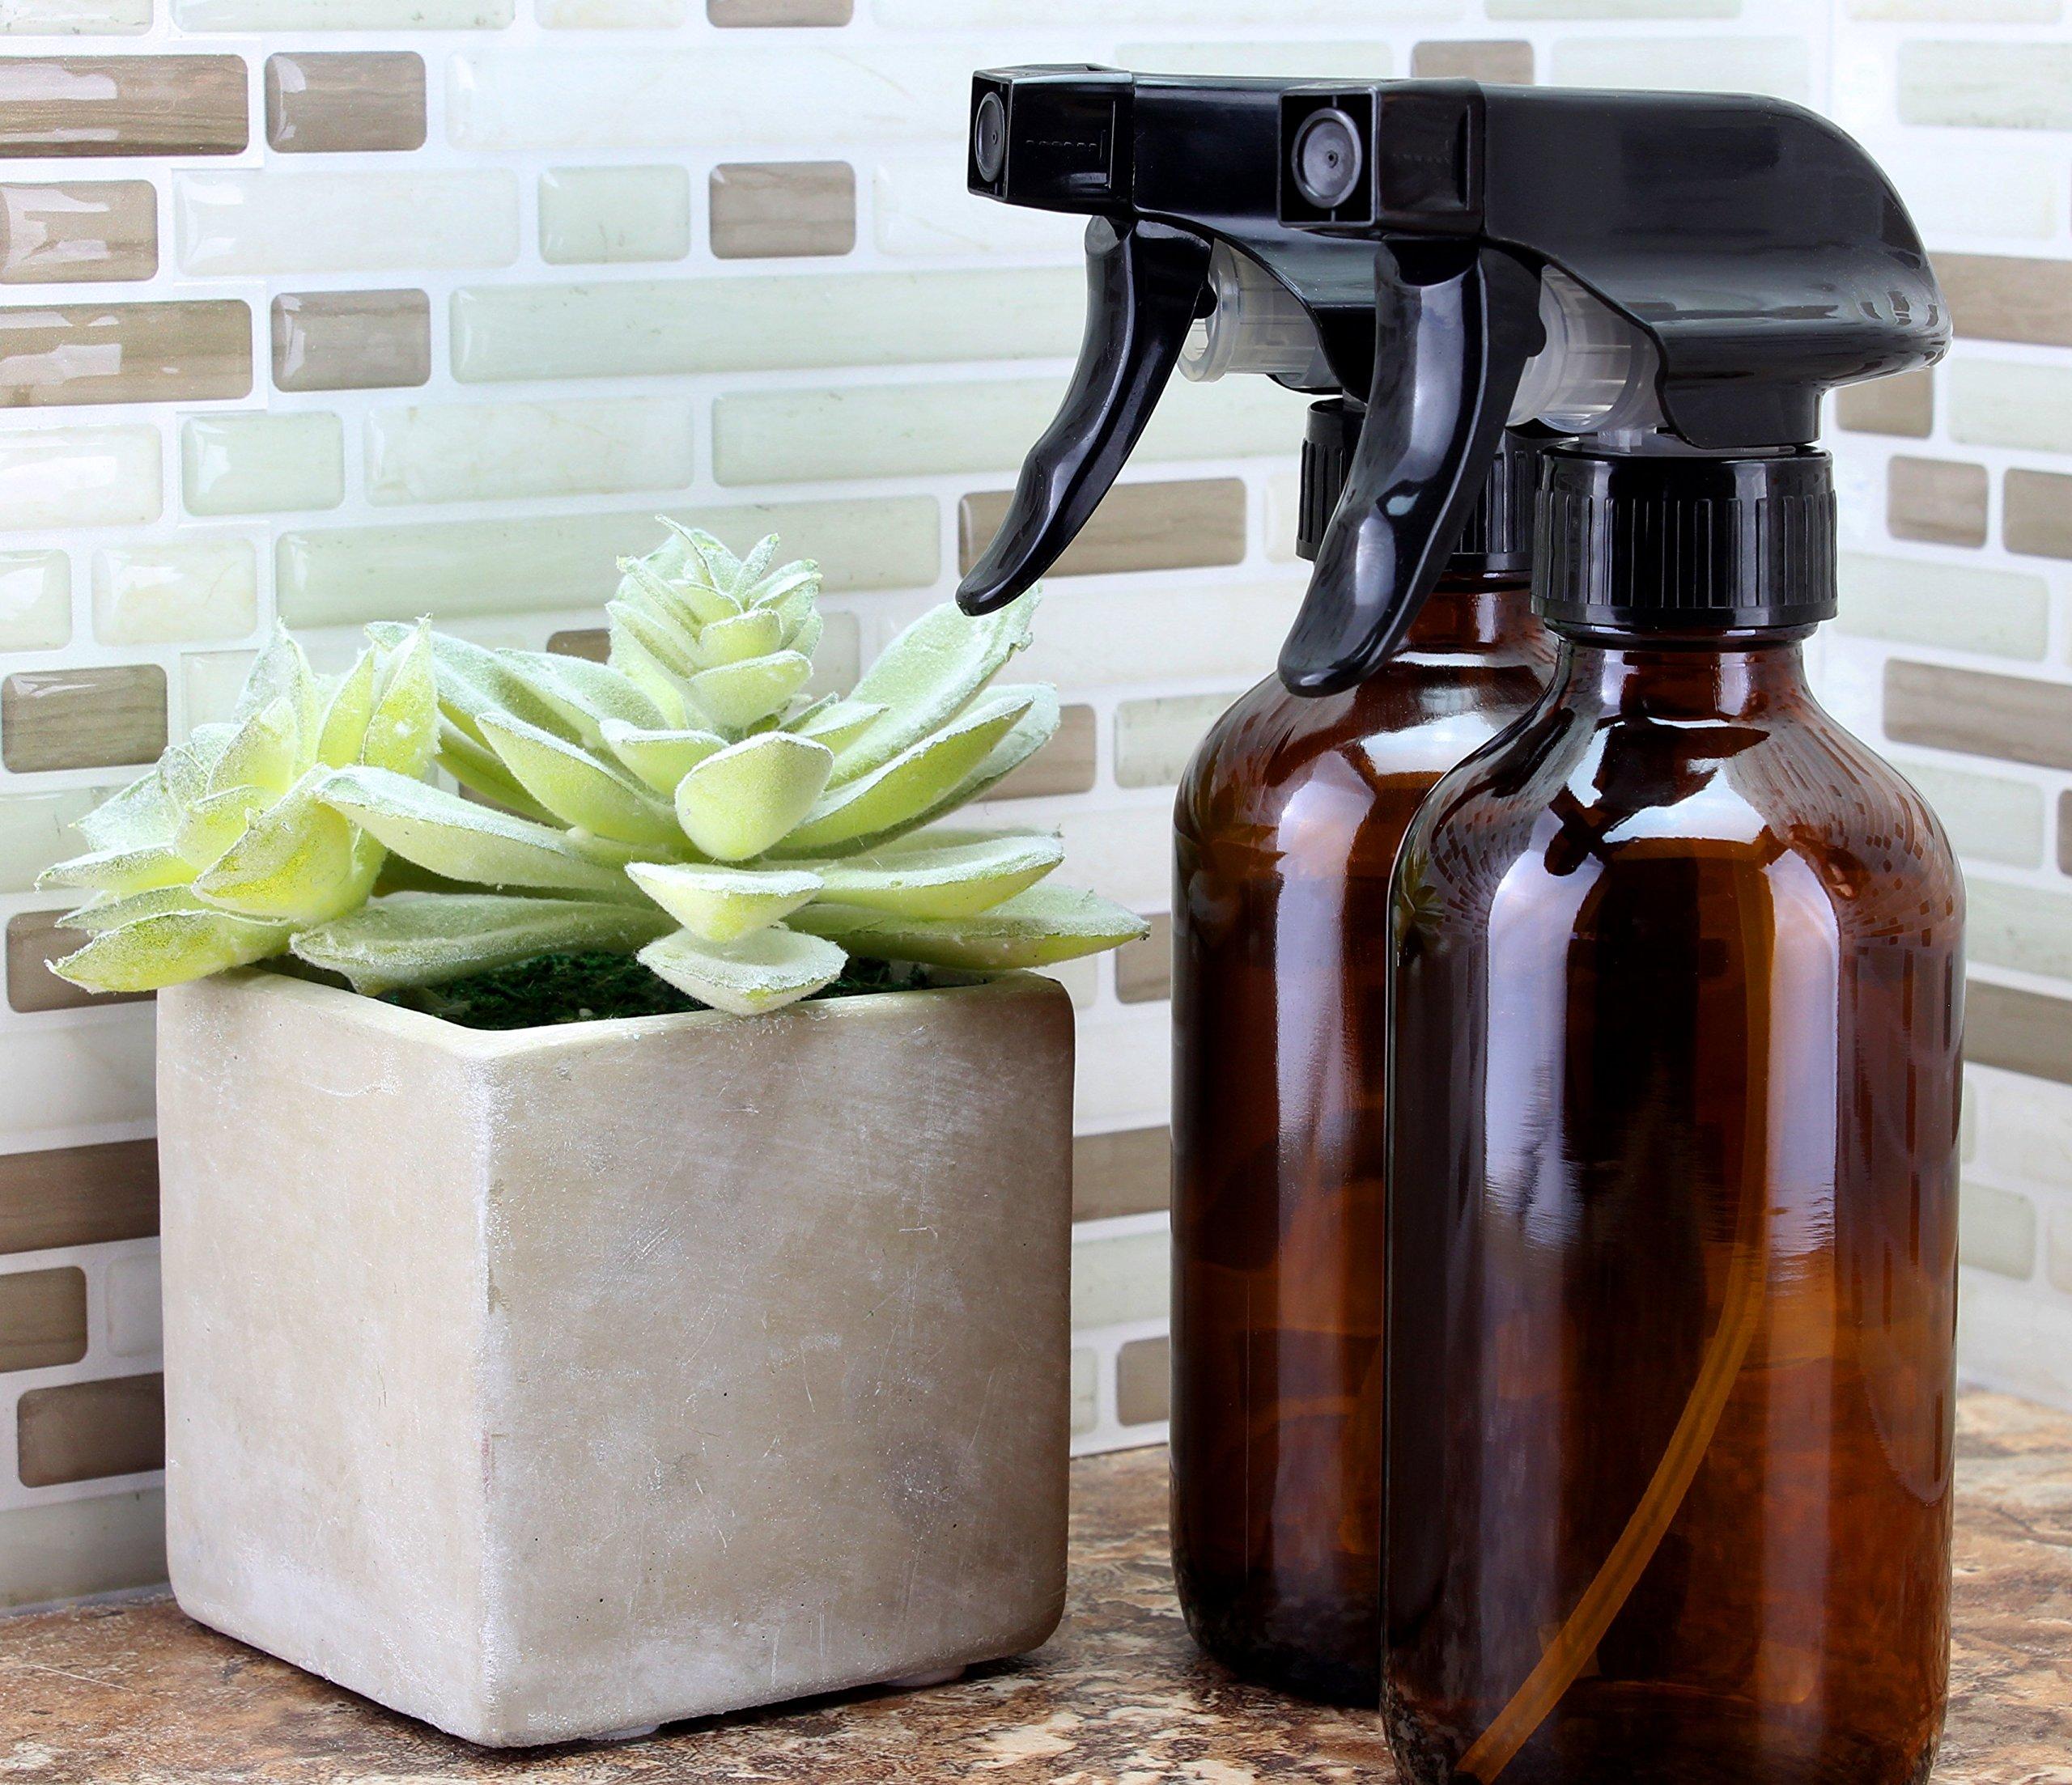 8oz Amber Glass Boston Round Spray Bottles (2 Pack); w/ Heavy Duty Mist & Stream Sprayers Perfect for Essential Oil Blends by Cornucopia Brands (Image #2)